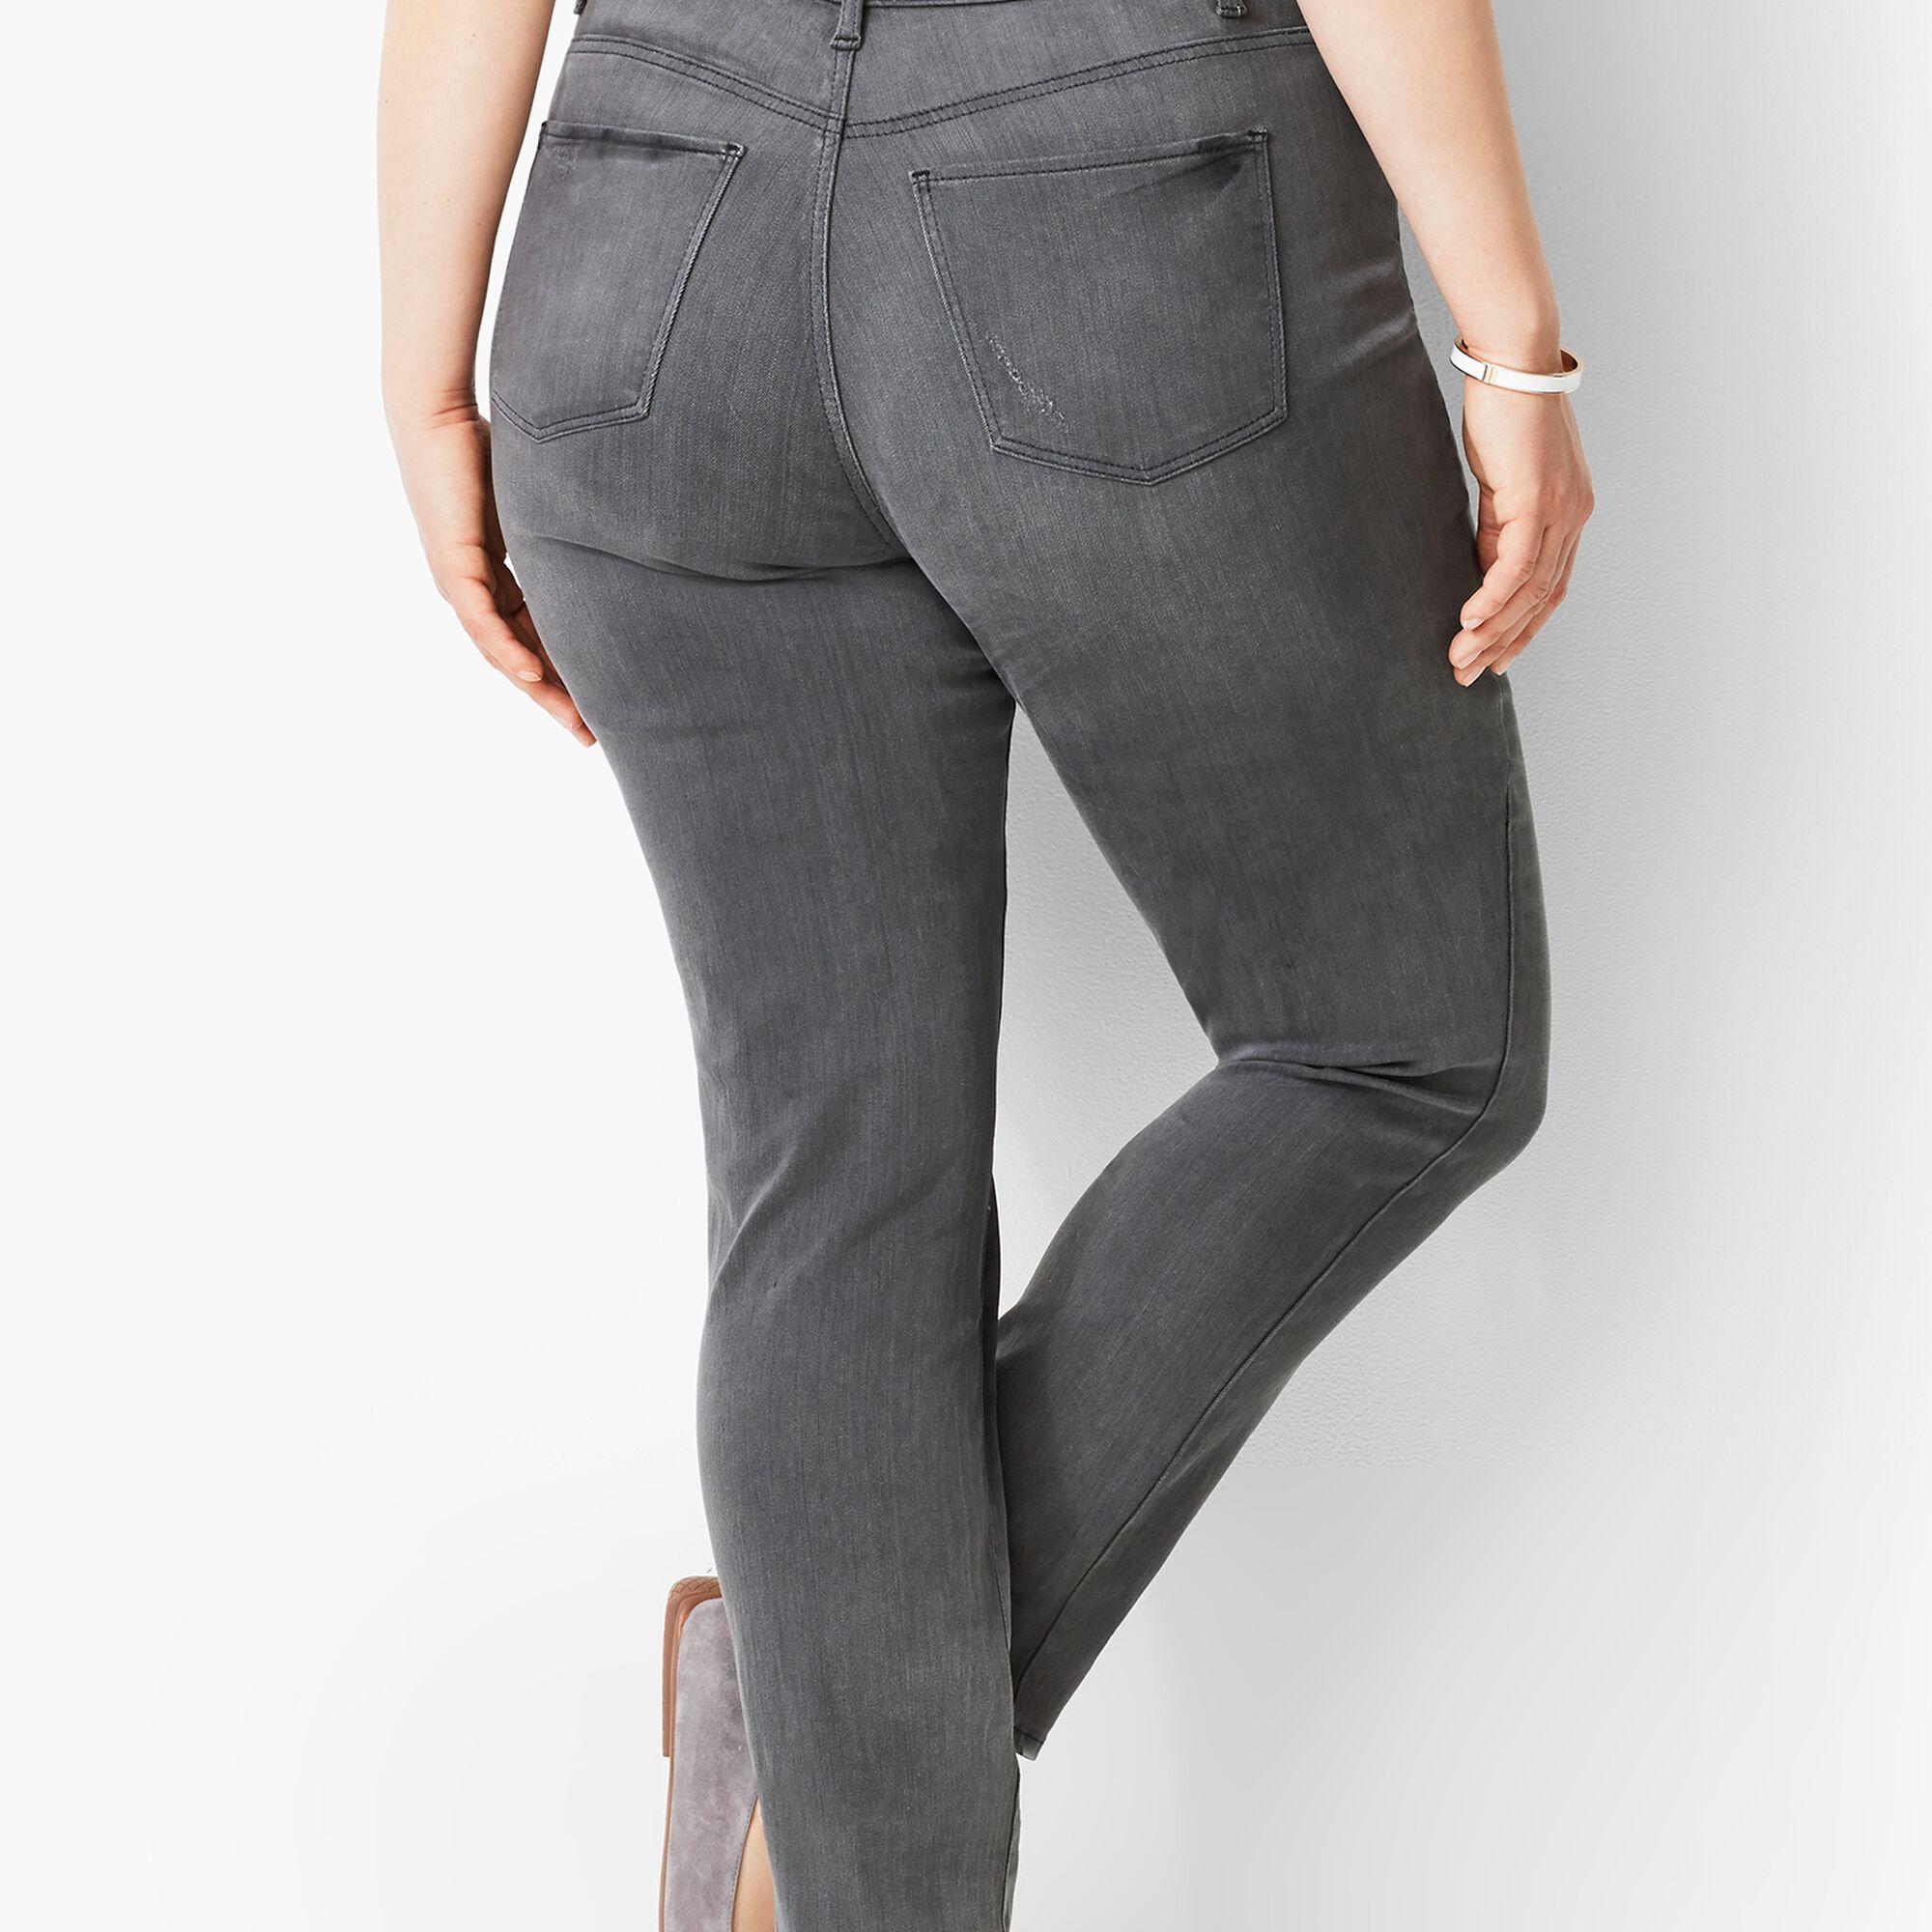 44768b29b3 Plus Size Exclusive Slim Ankle Jeans - Luna Grey Opens a New Window.